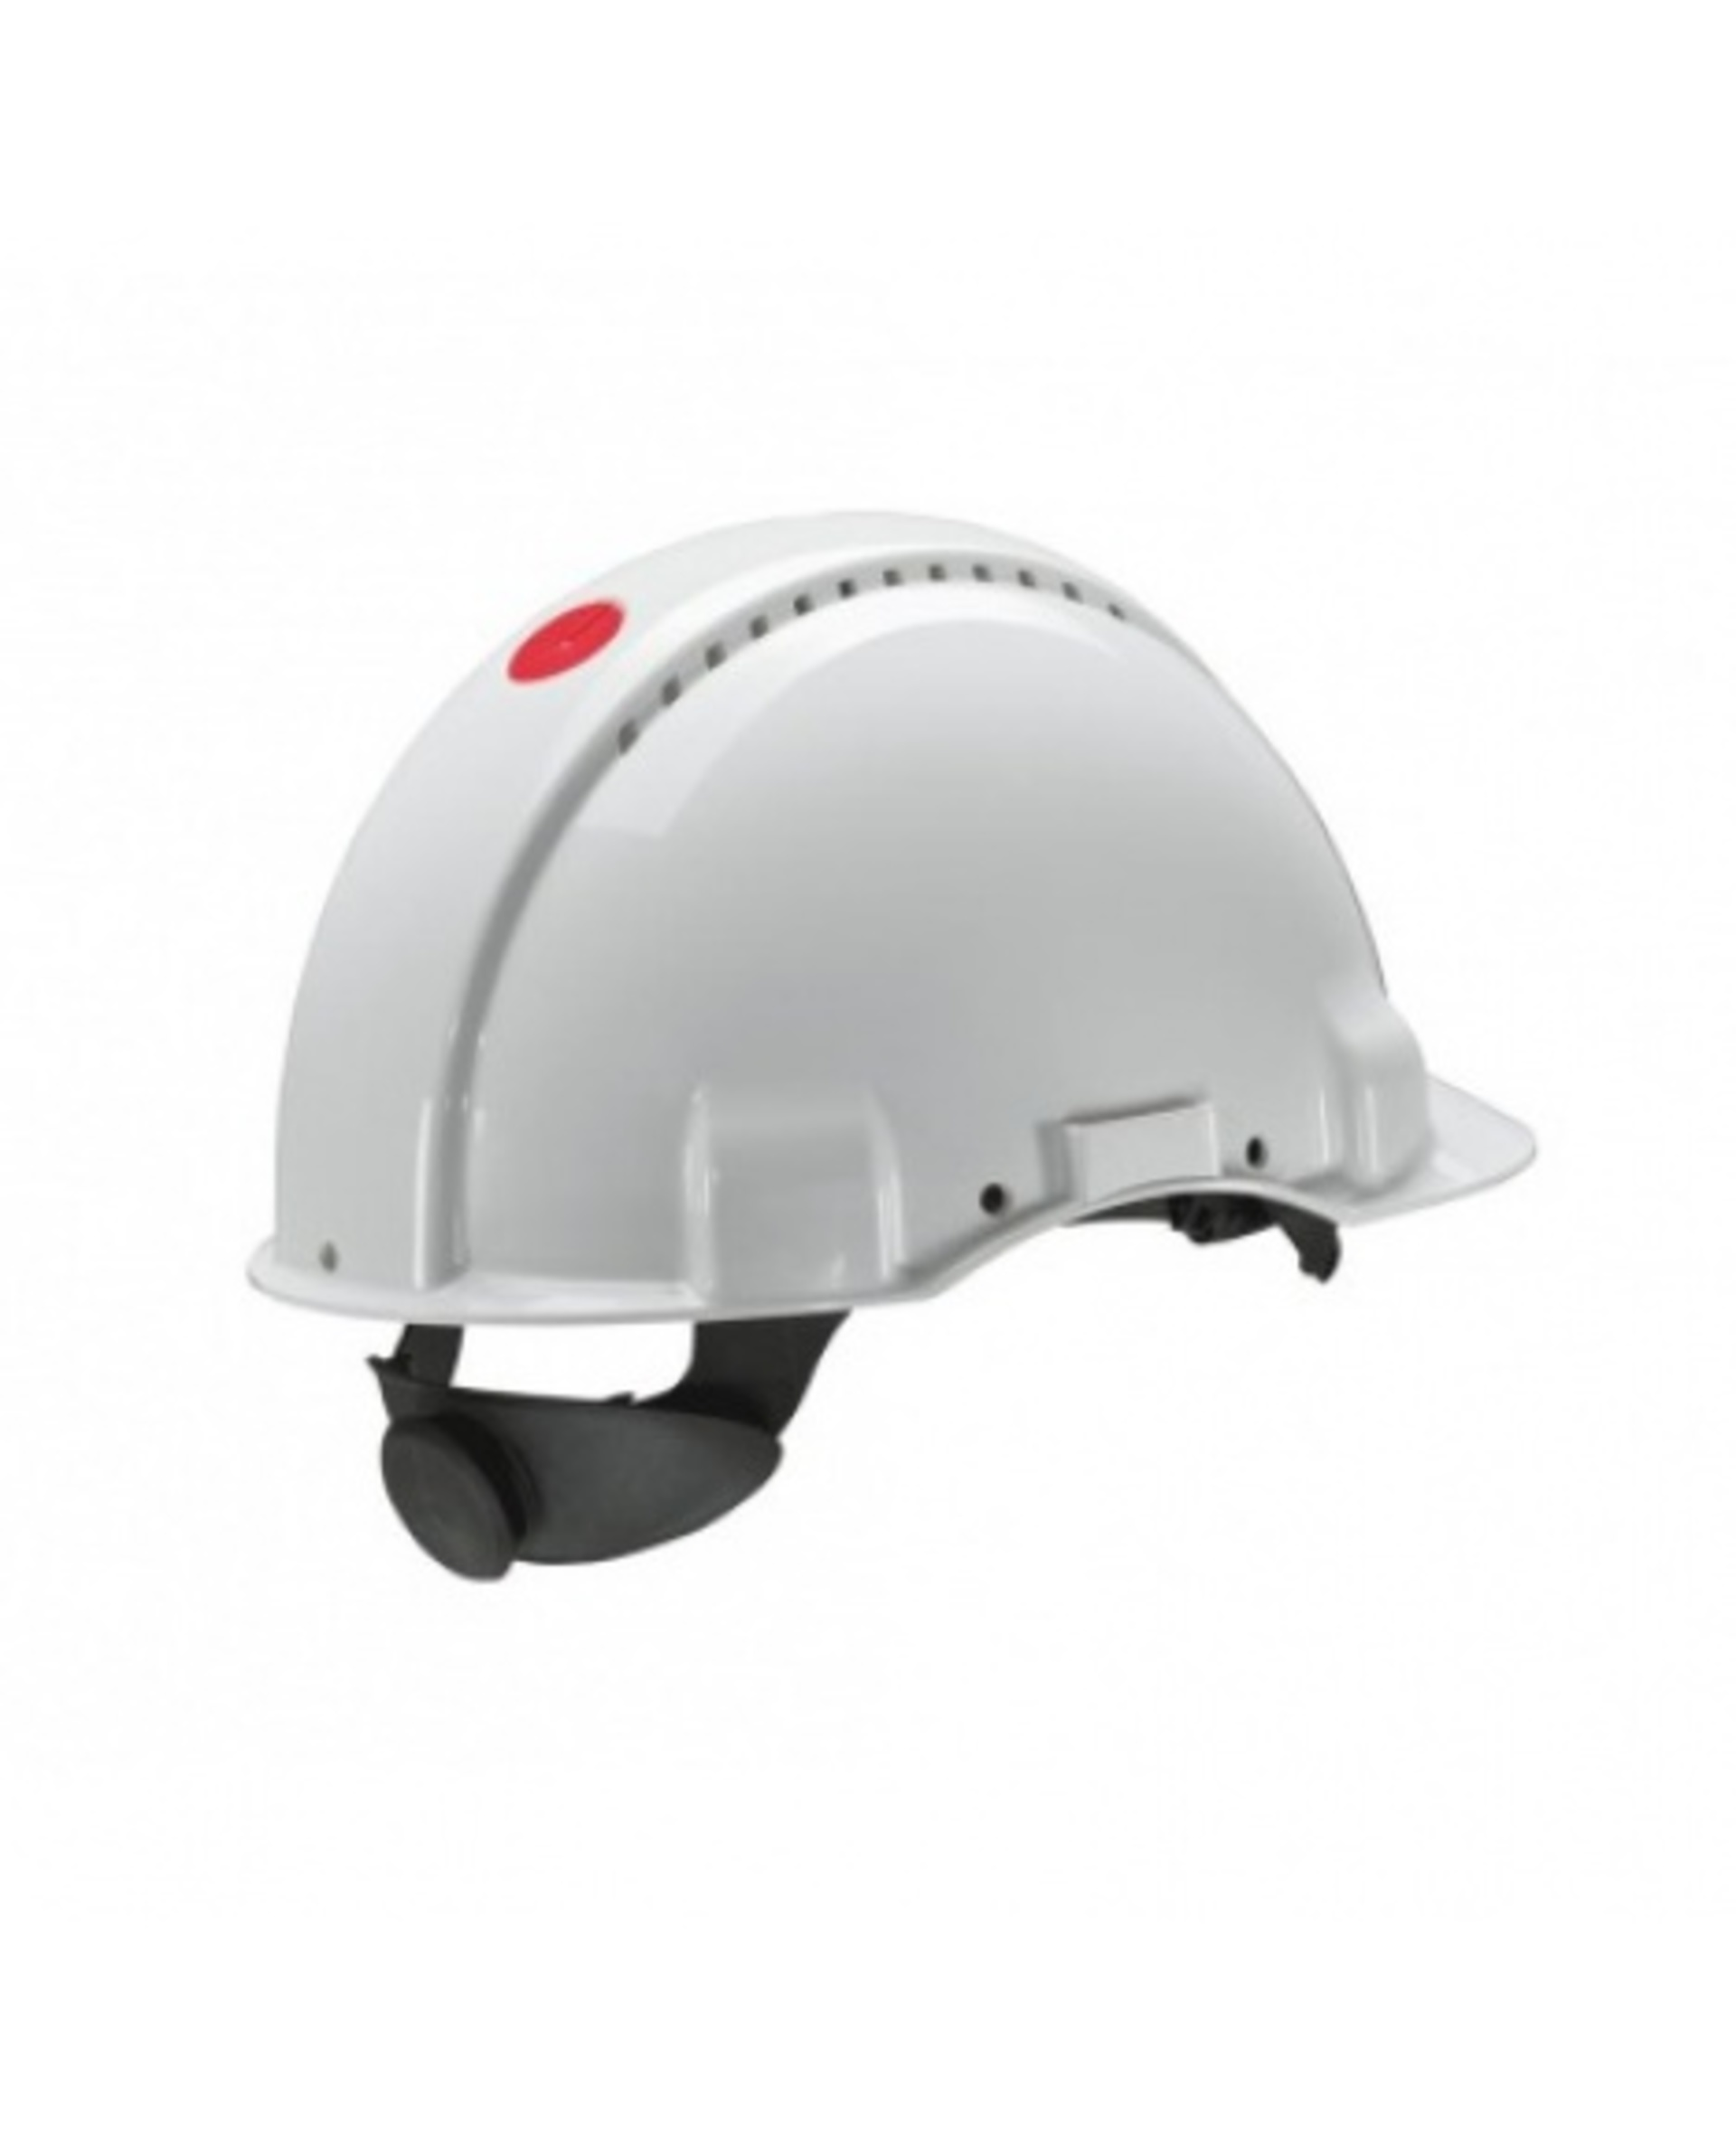 3M PELTOR G3000 Ochranná přilba bílá